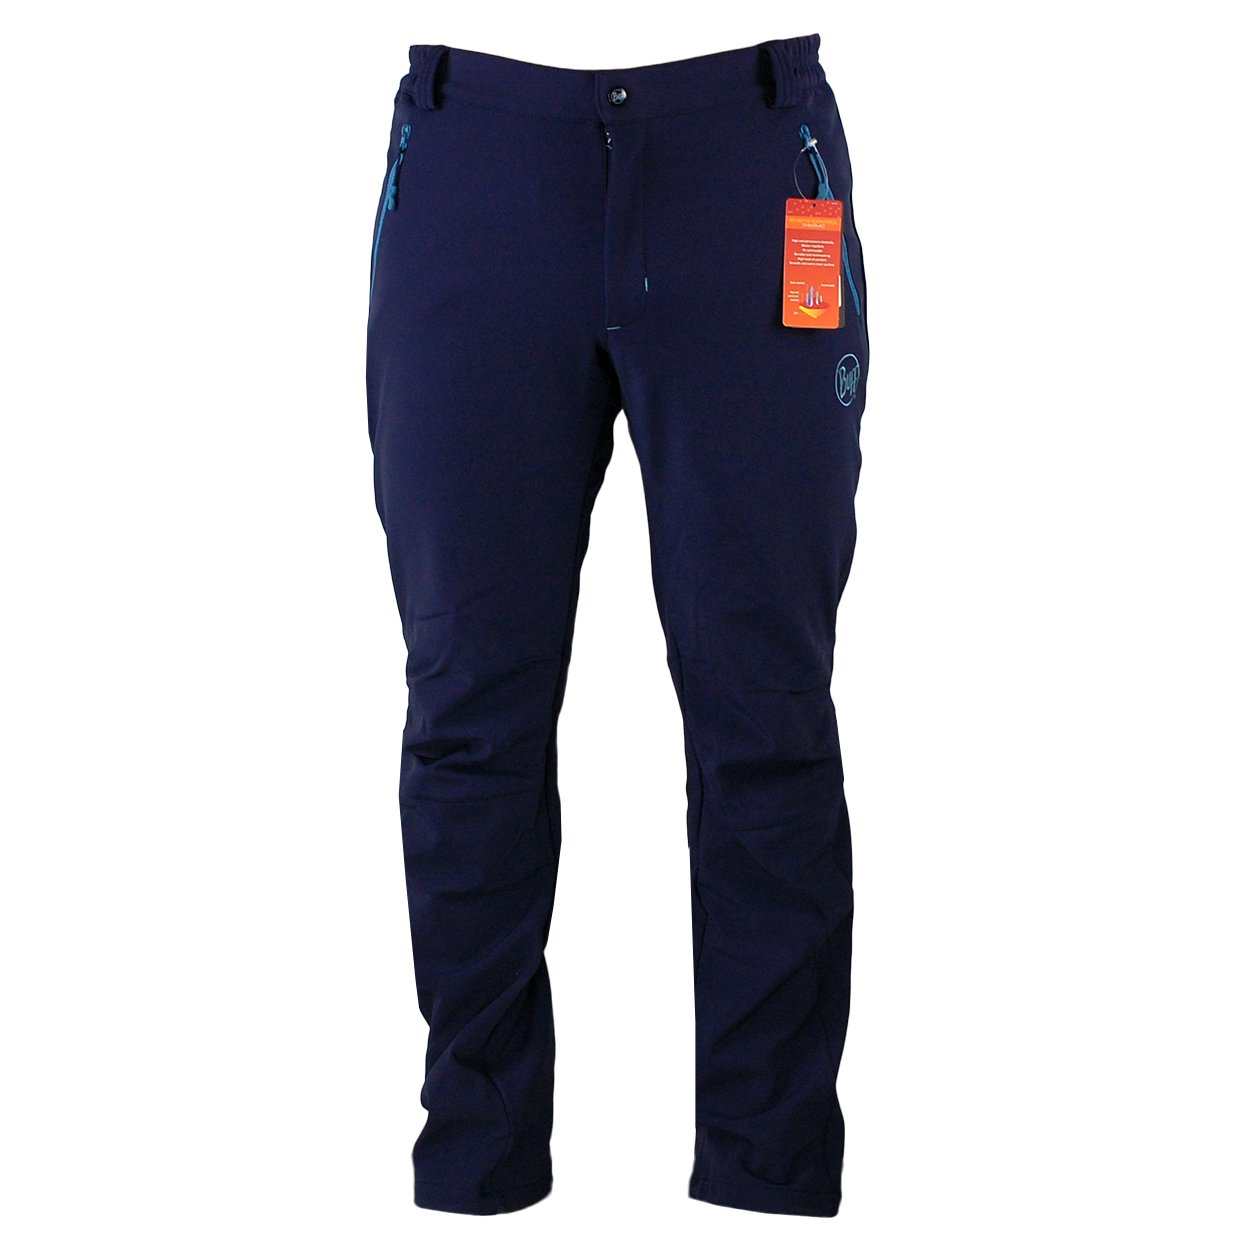 Buff Herren Trekking Pant Hunt - Farbe Blau